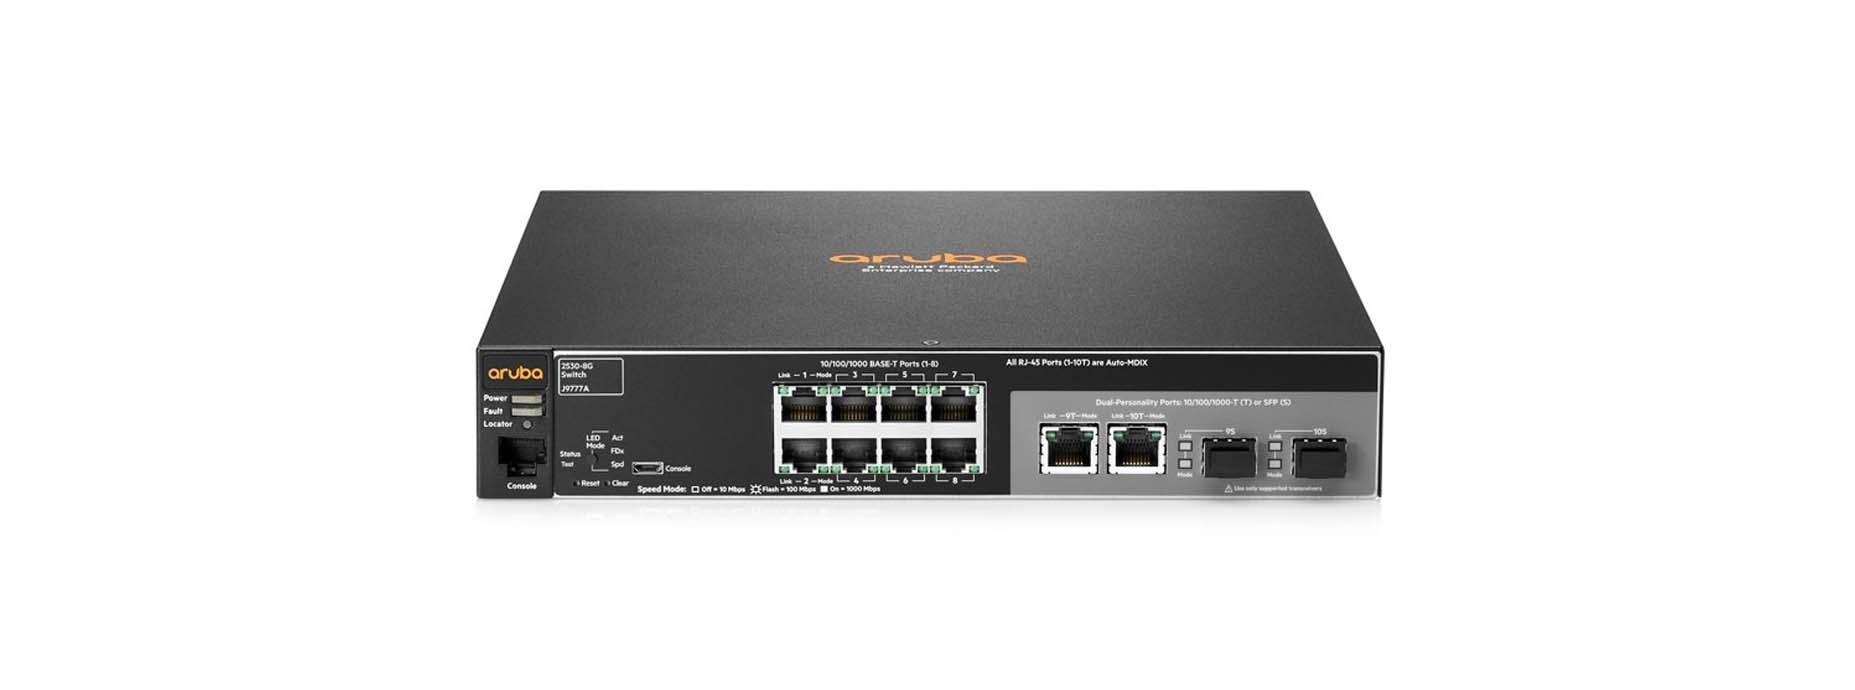 Harga HP Switch Managed Aruba 2530-8G (J9777A)